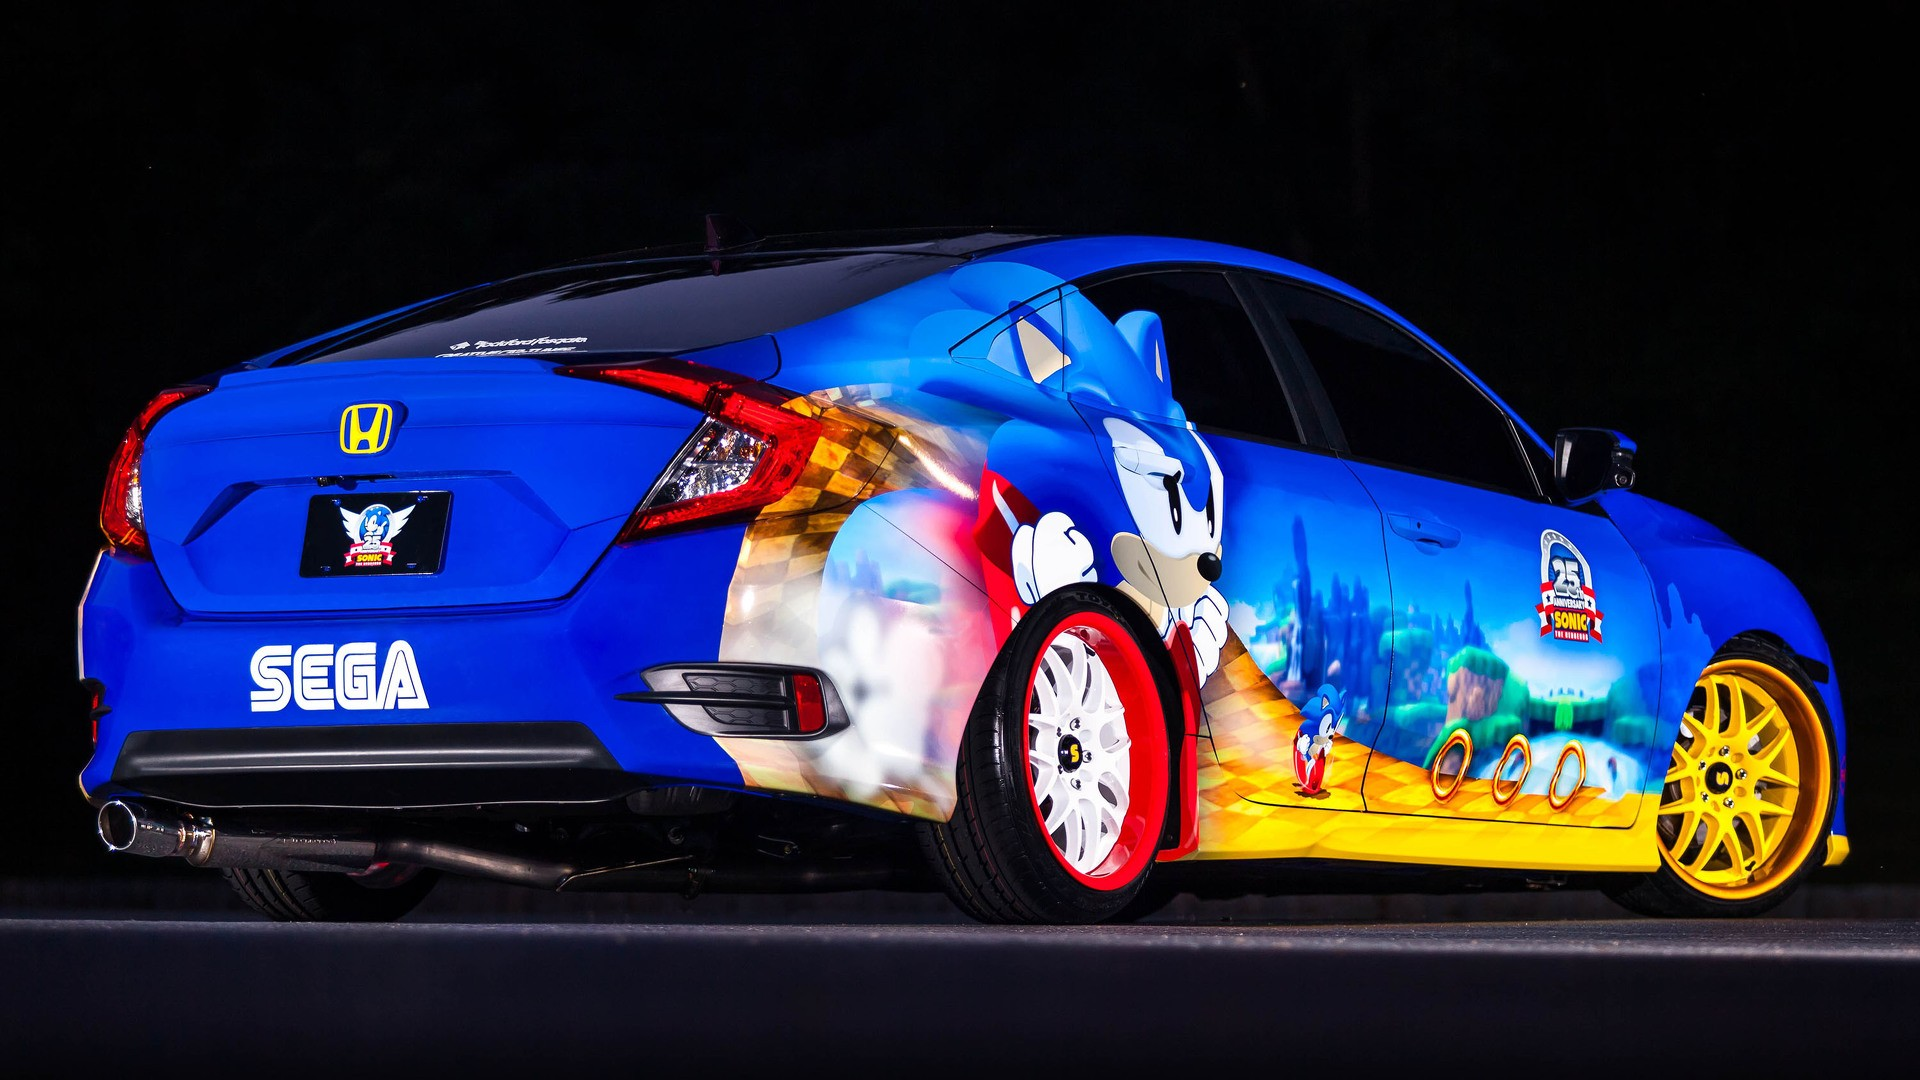 Sonic The Hedgehog Gets Unique Honda Civic As 25th